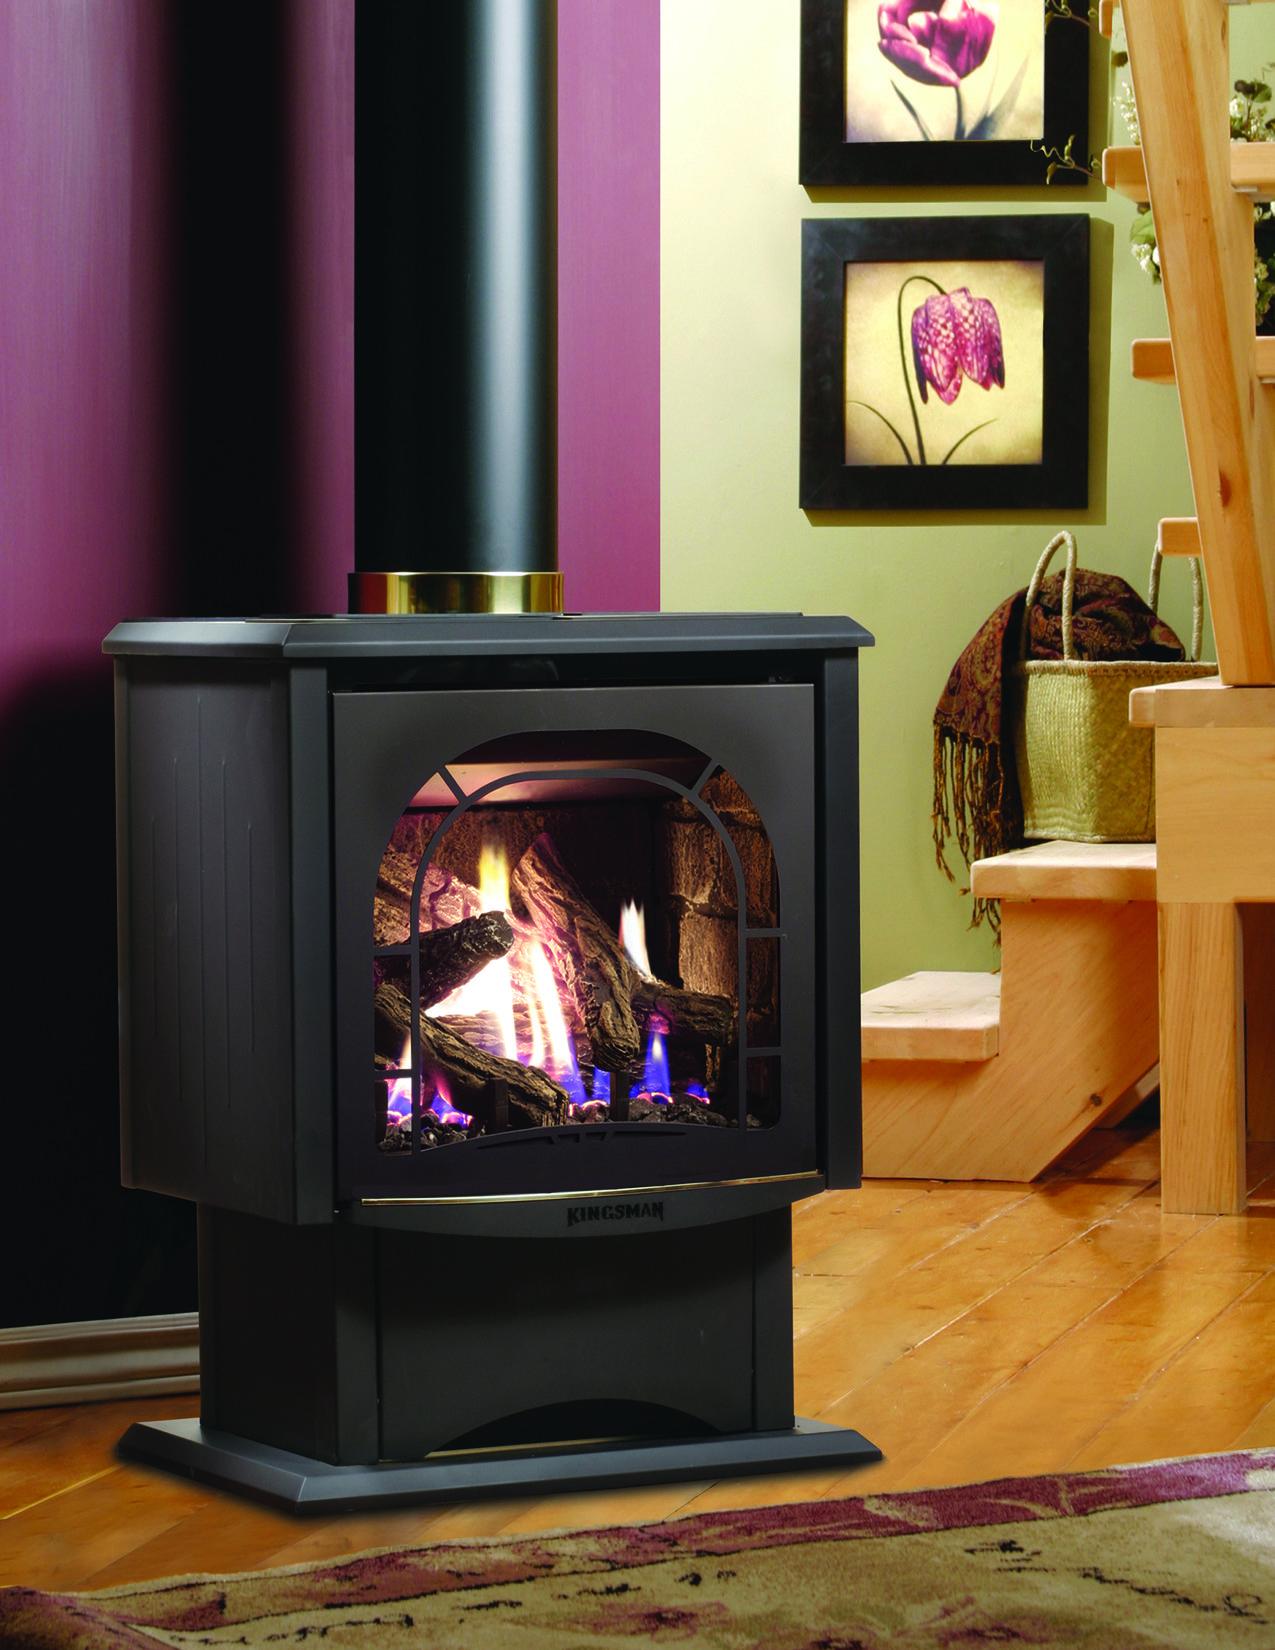 Kingsman Fireplace Wood Burning Fireplace Inserts Freestanding